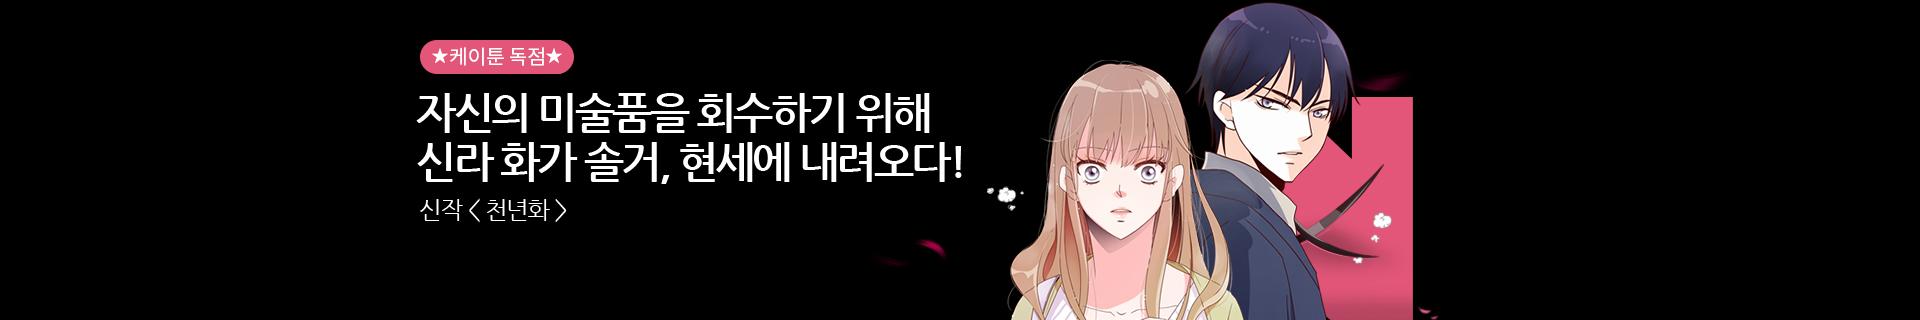 PC_sub_bn_웹툰신작_천년화_1920x320.jpg